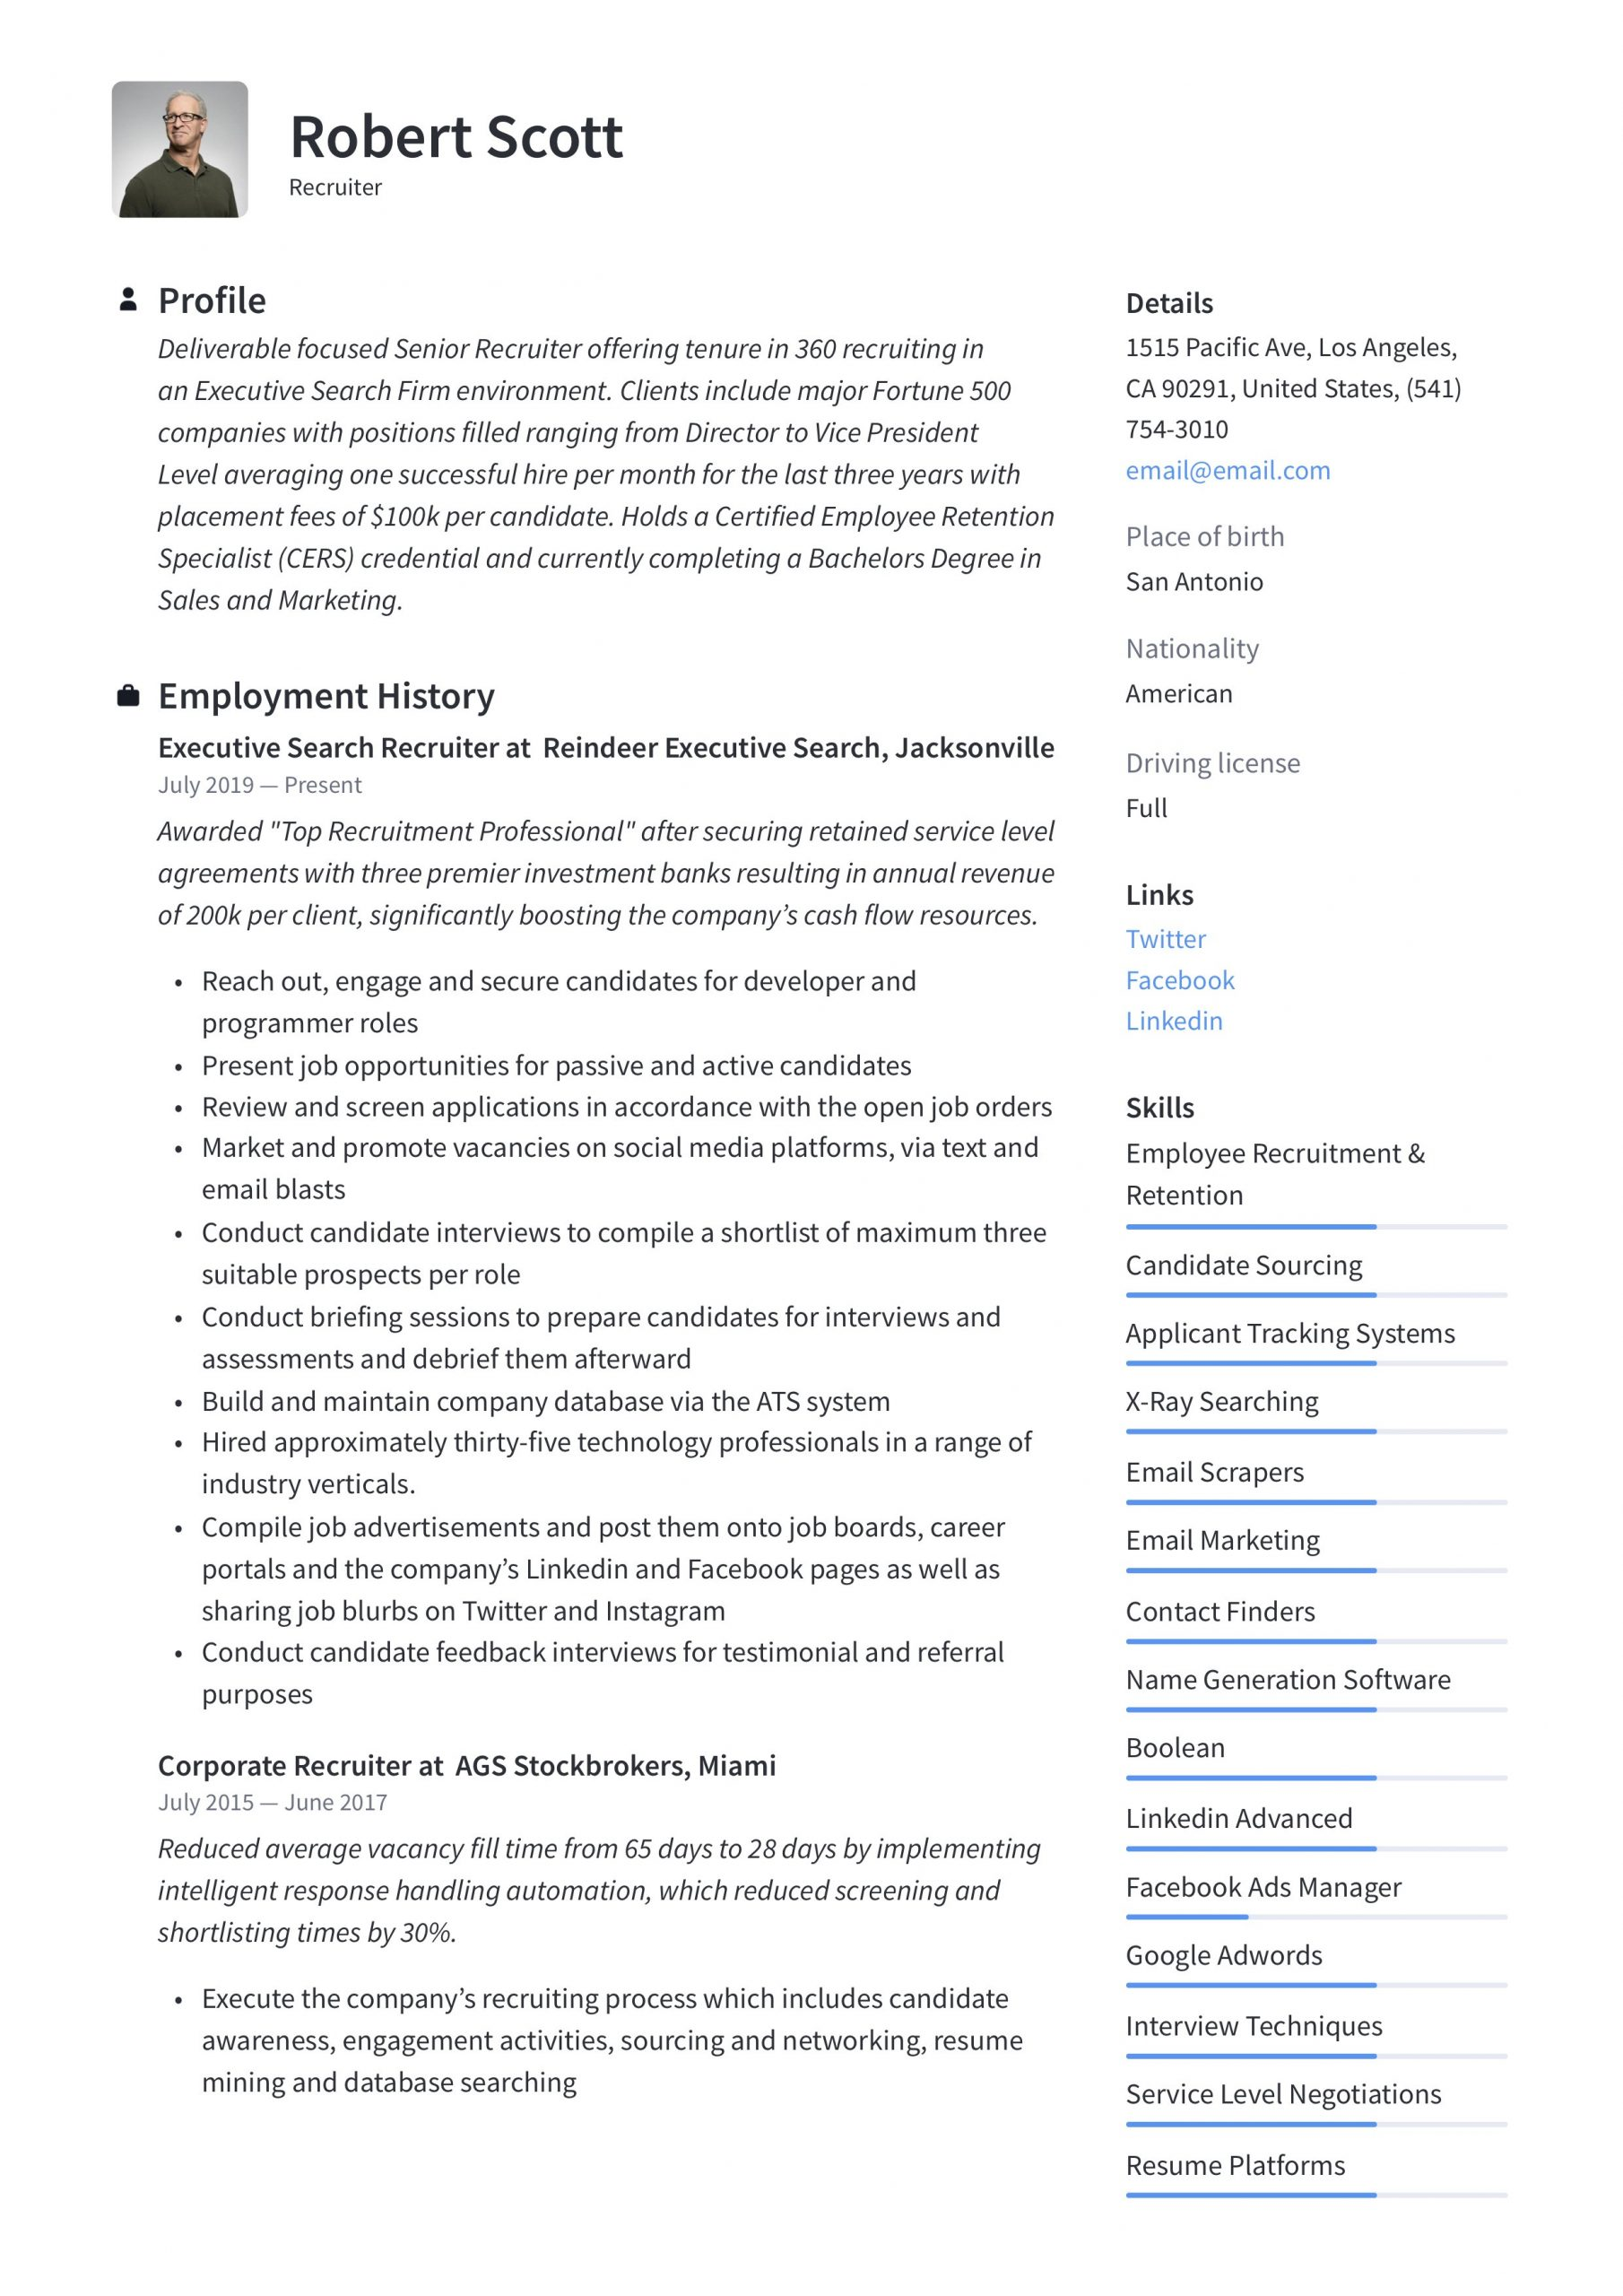 Recruiter Resume & Writing Guide 12 PDF Examples